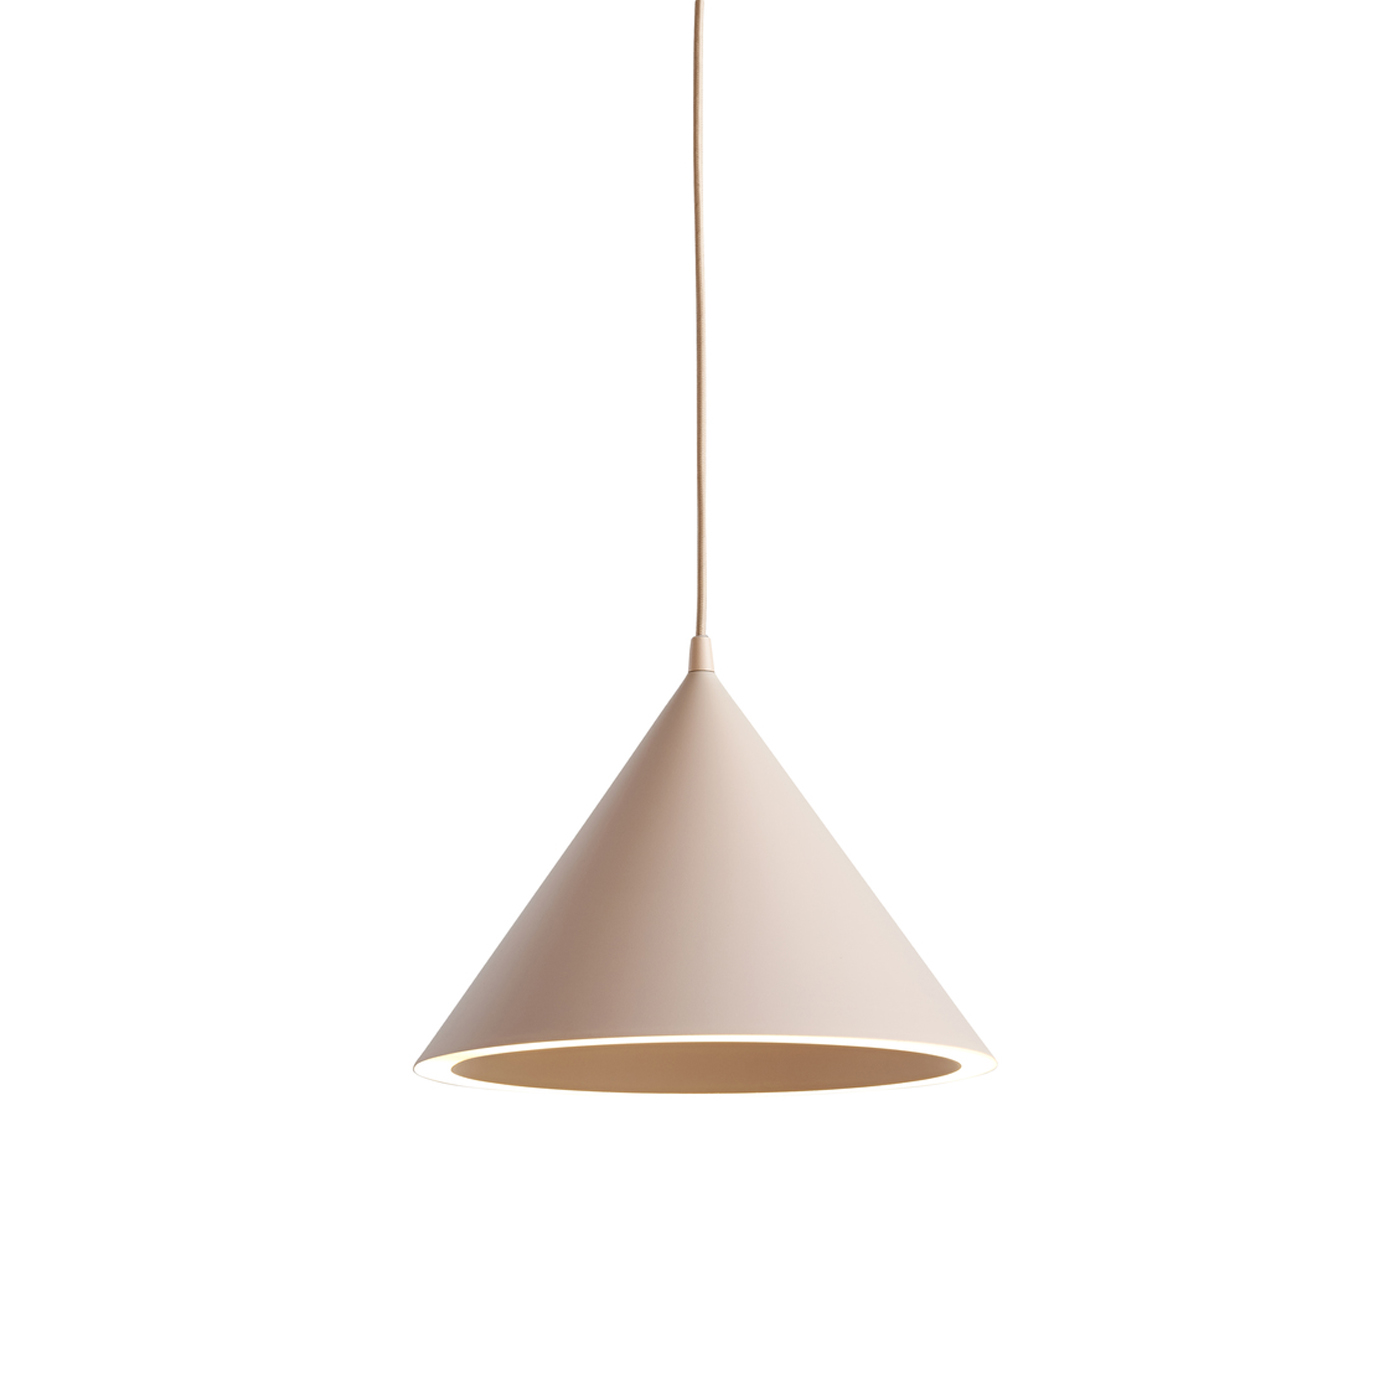 WOUD Annular loftlampe - nude, kegleformet (Ø32)